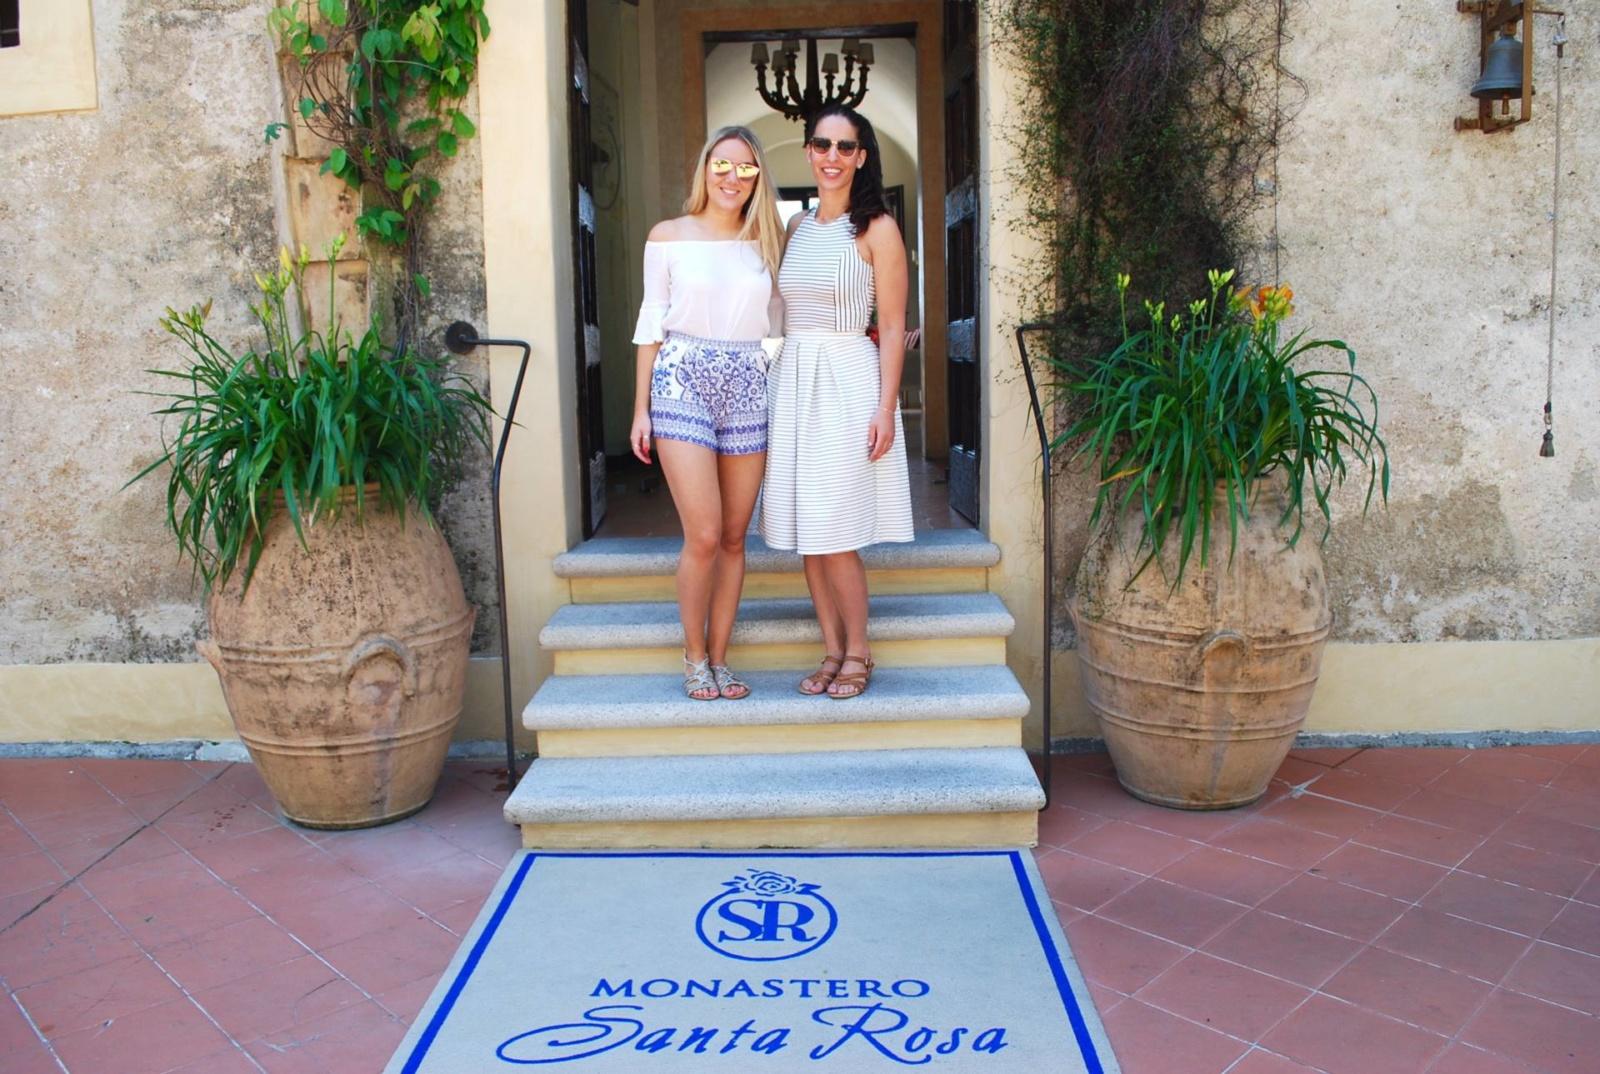 monastero-santa-rosa-amalfi-the-travelista-jess-gibson5